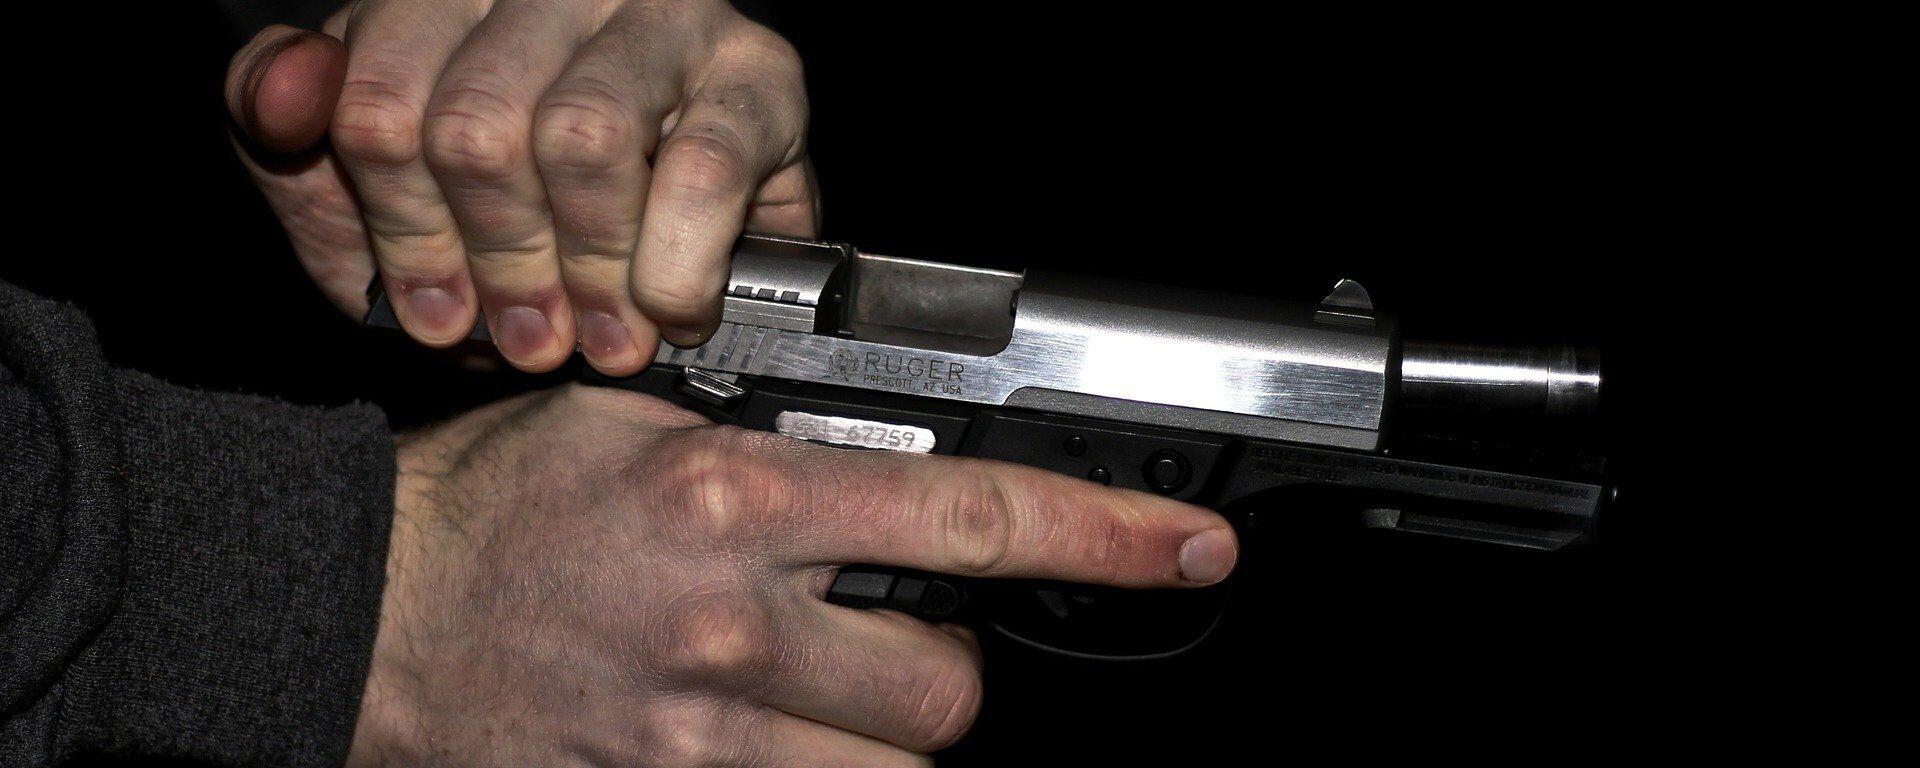 Una pistola (imagen referencial) - Sputnik Mundo, 1920, 13.06.2021